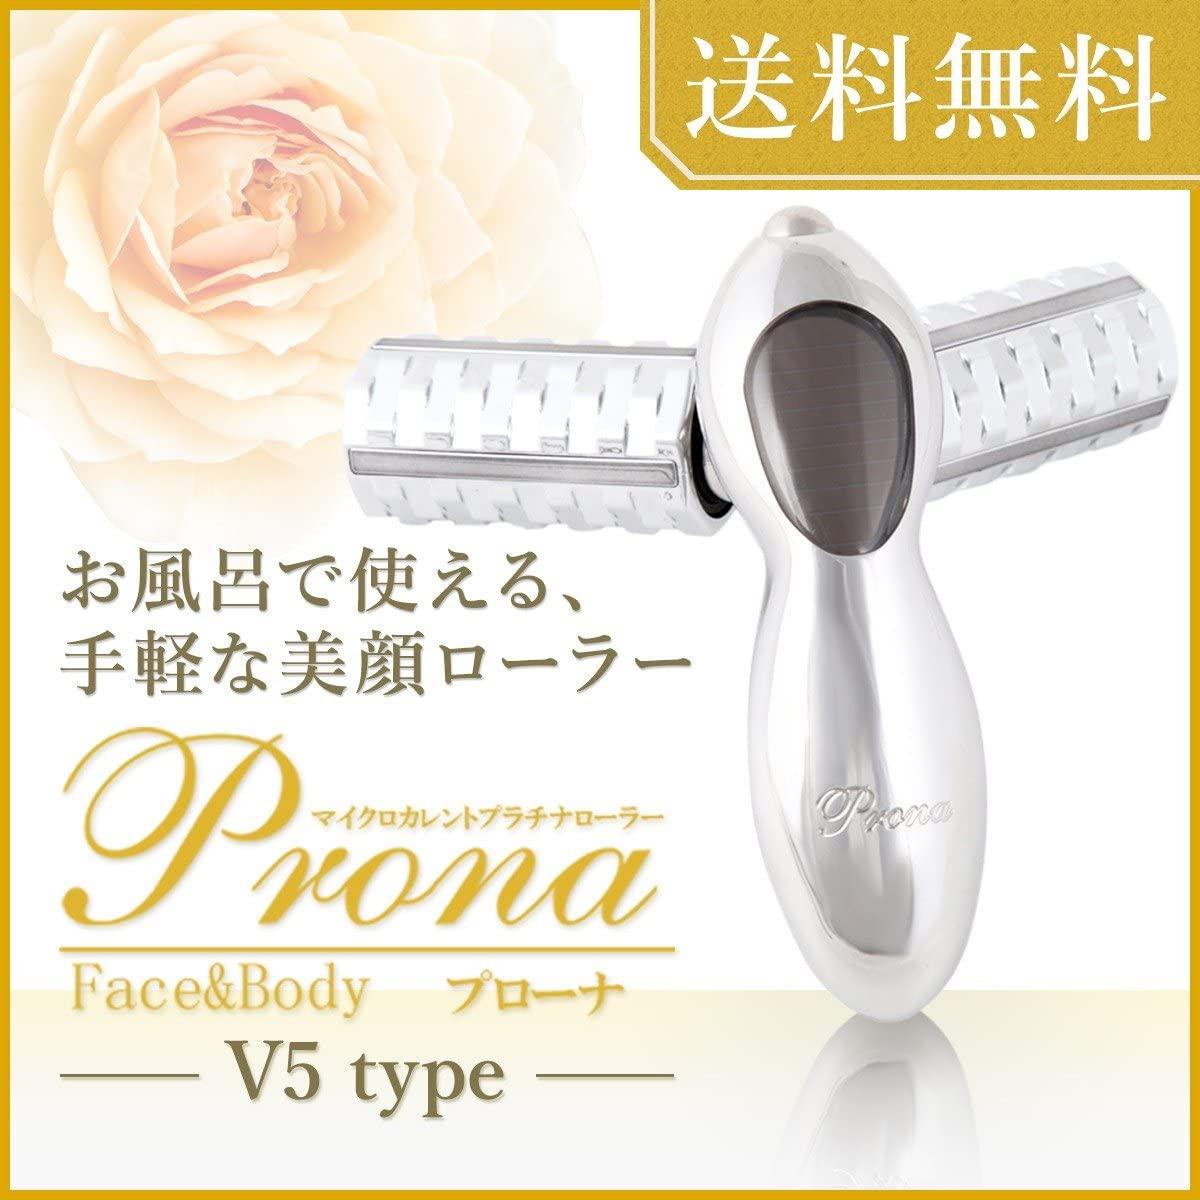 Prona 美顔ローラーの商品画像2